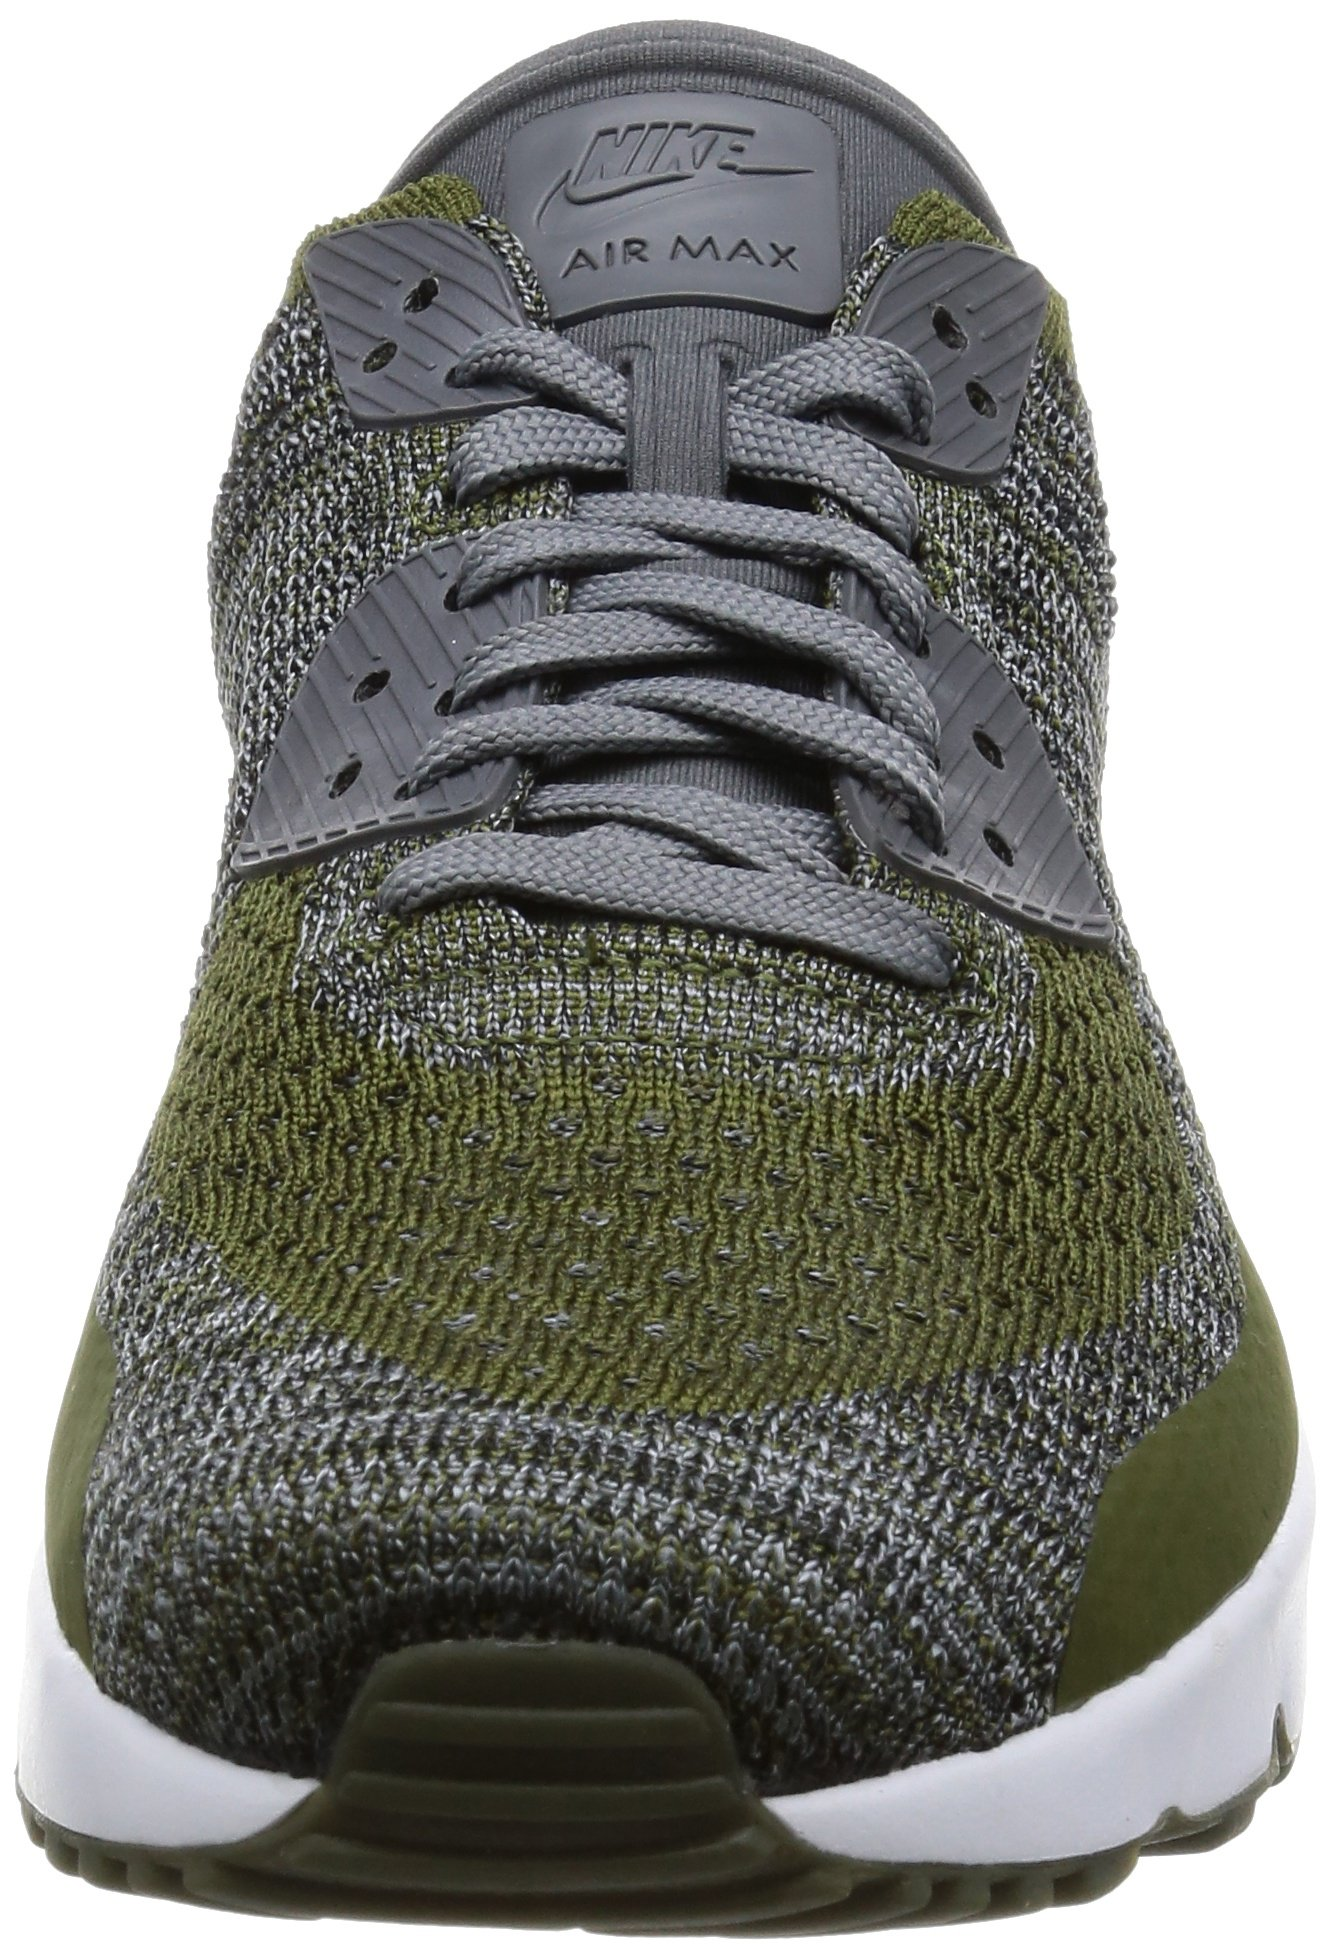 Nike - Air Max 90 Ultra 20 Flyknit - 875943300 - Dimensione: 42,5